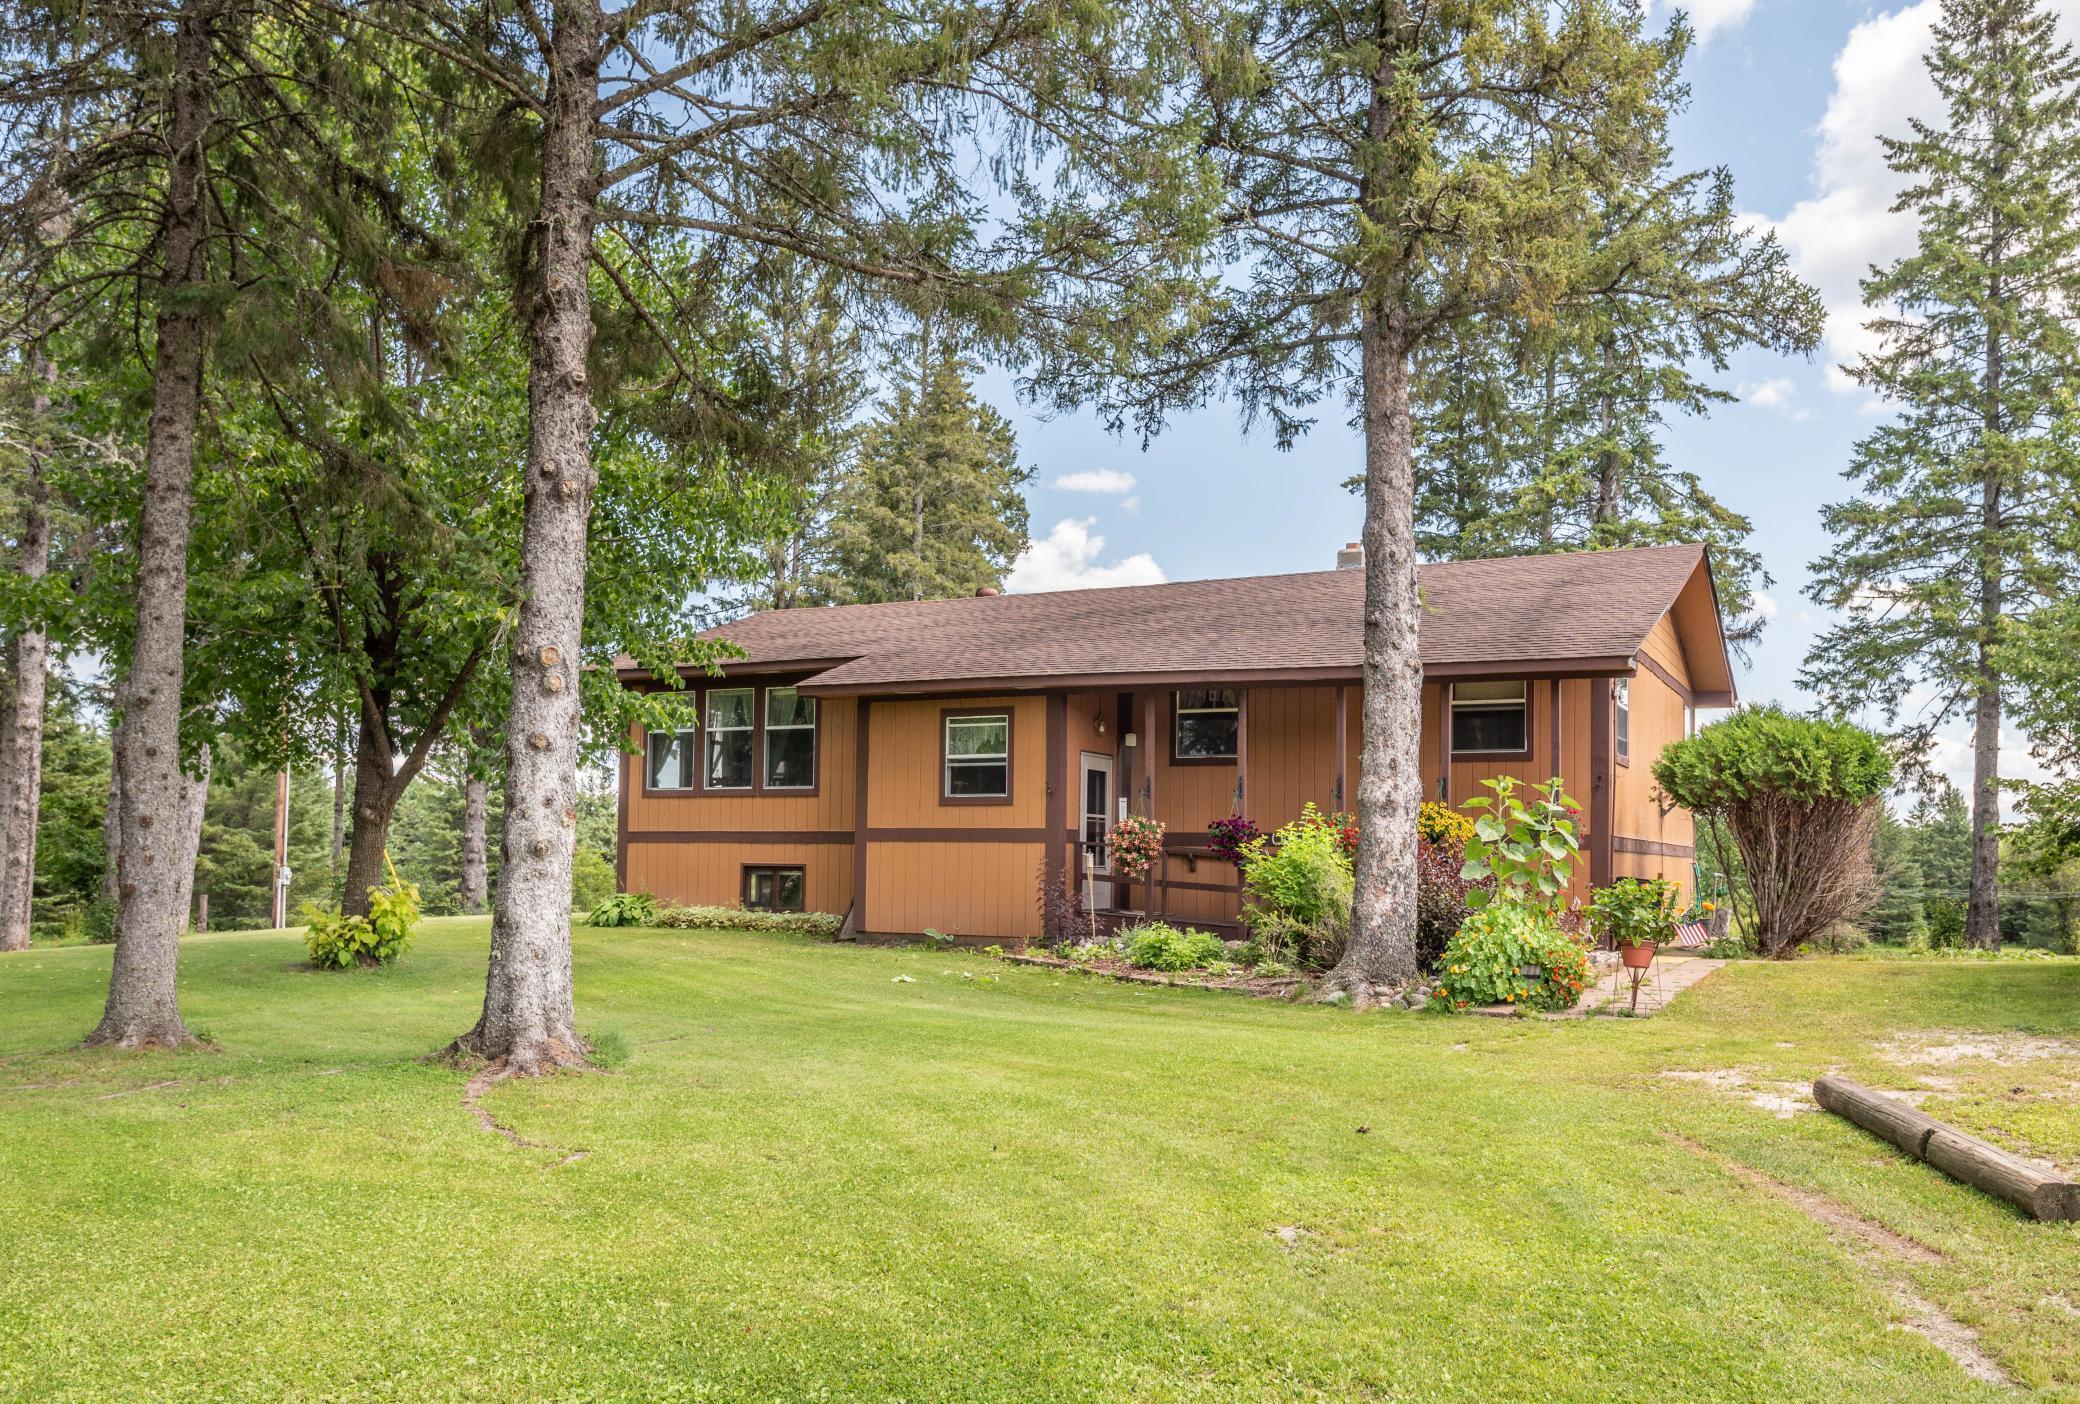 38405 Siro Road Property Photo - Bigfork, MN real estate listing